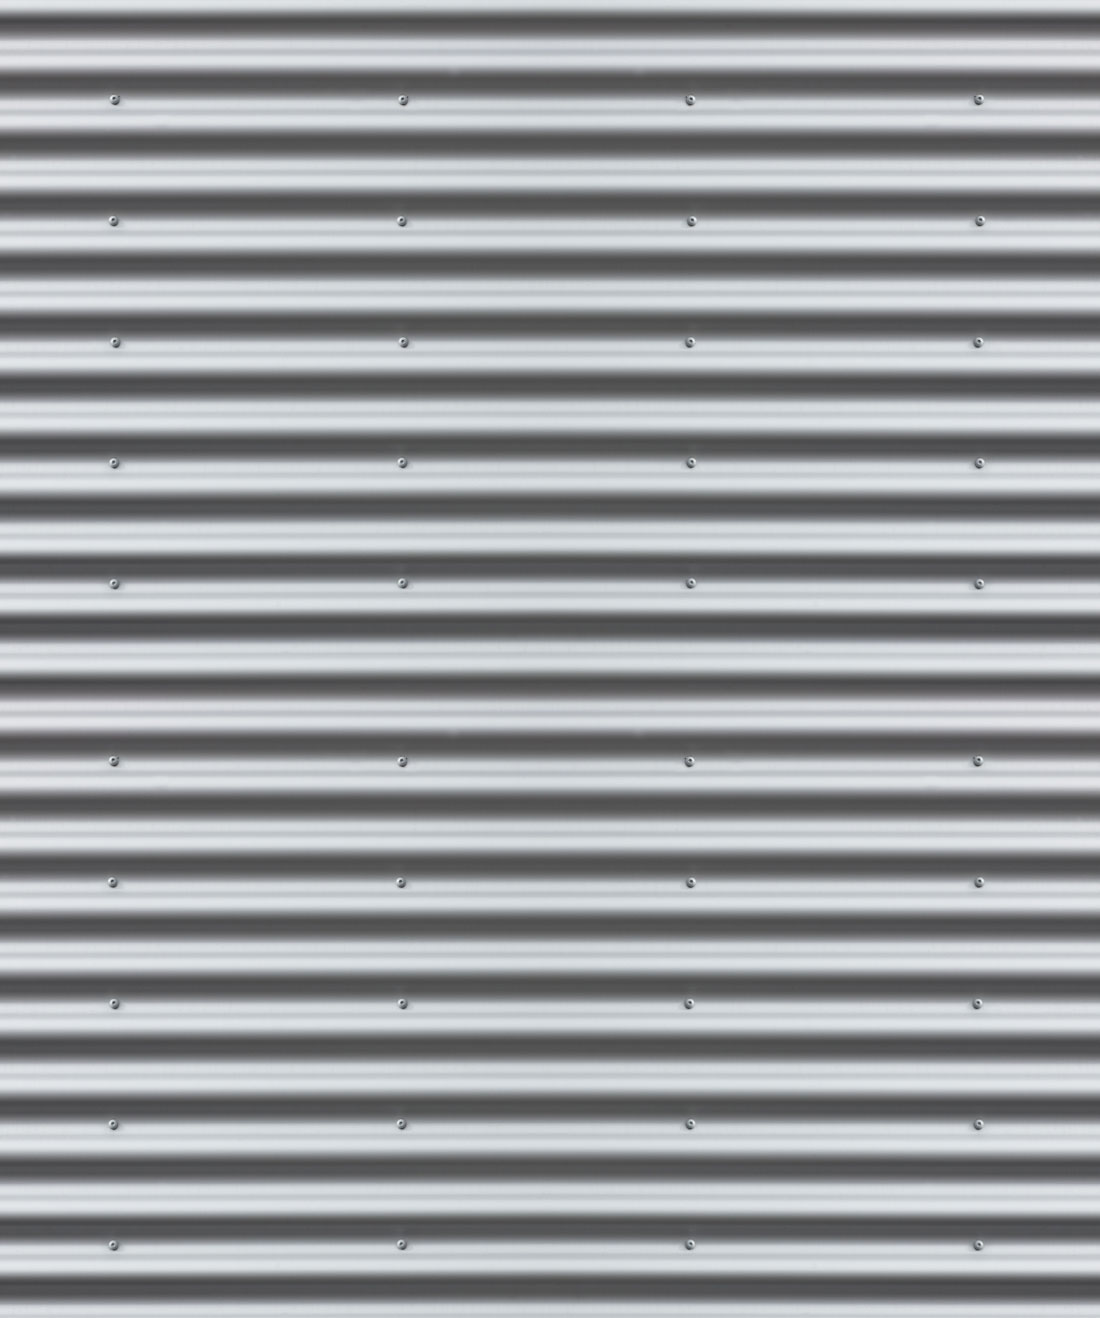 Corrugated Iron Wallpaper